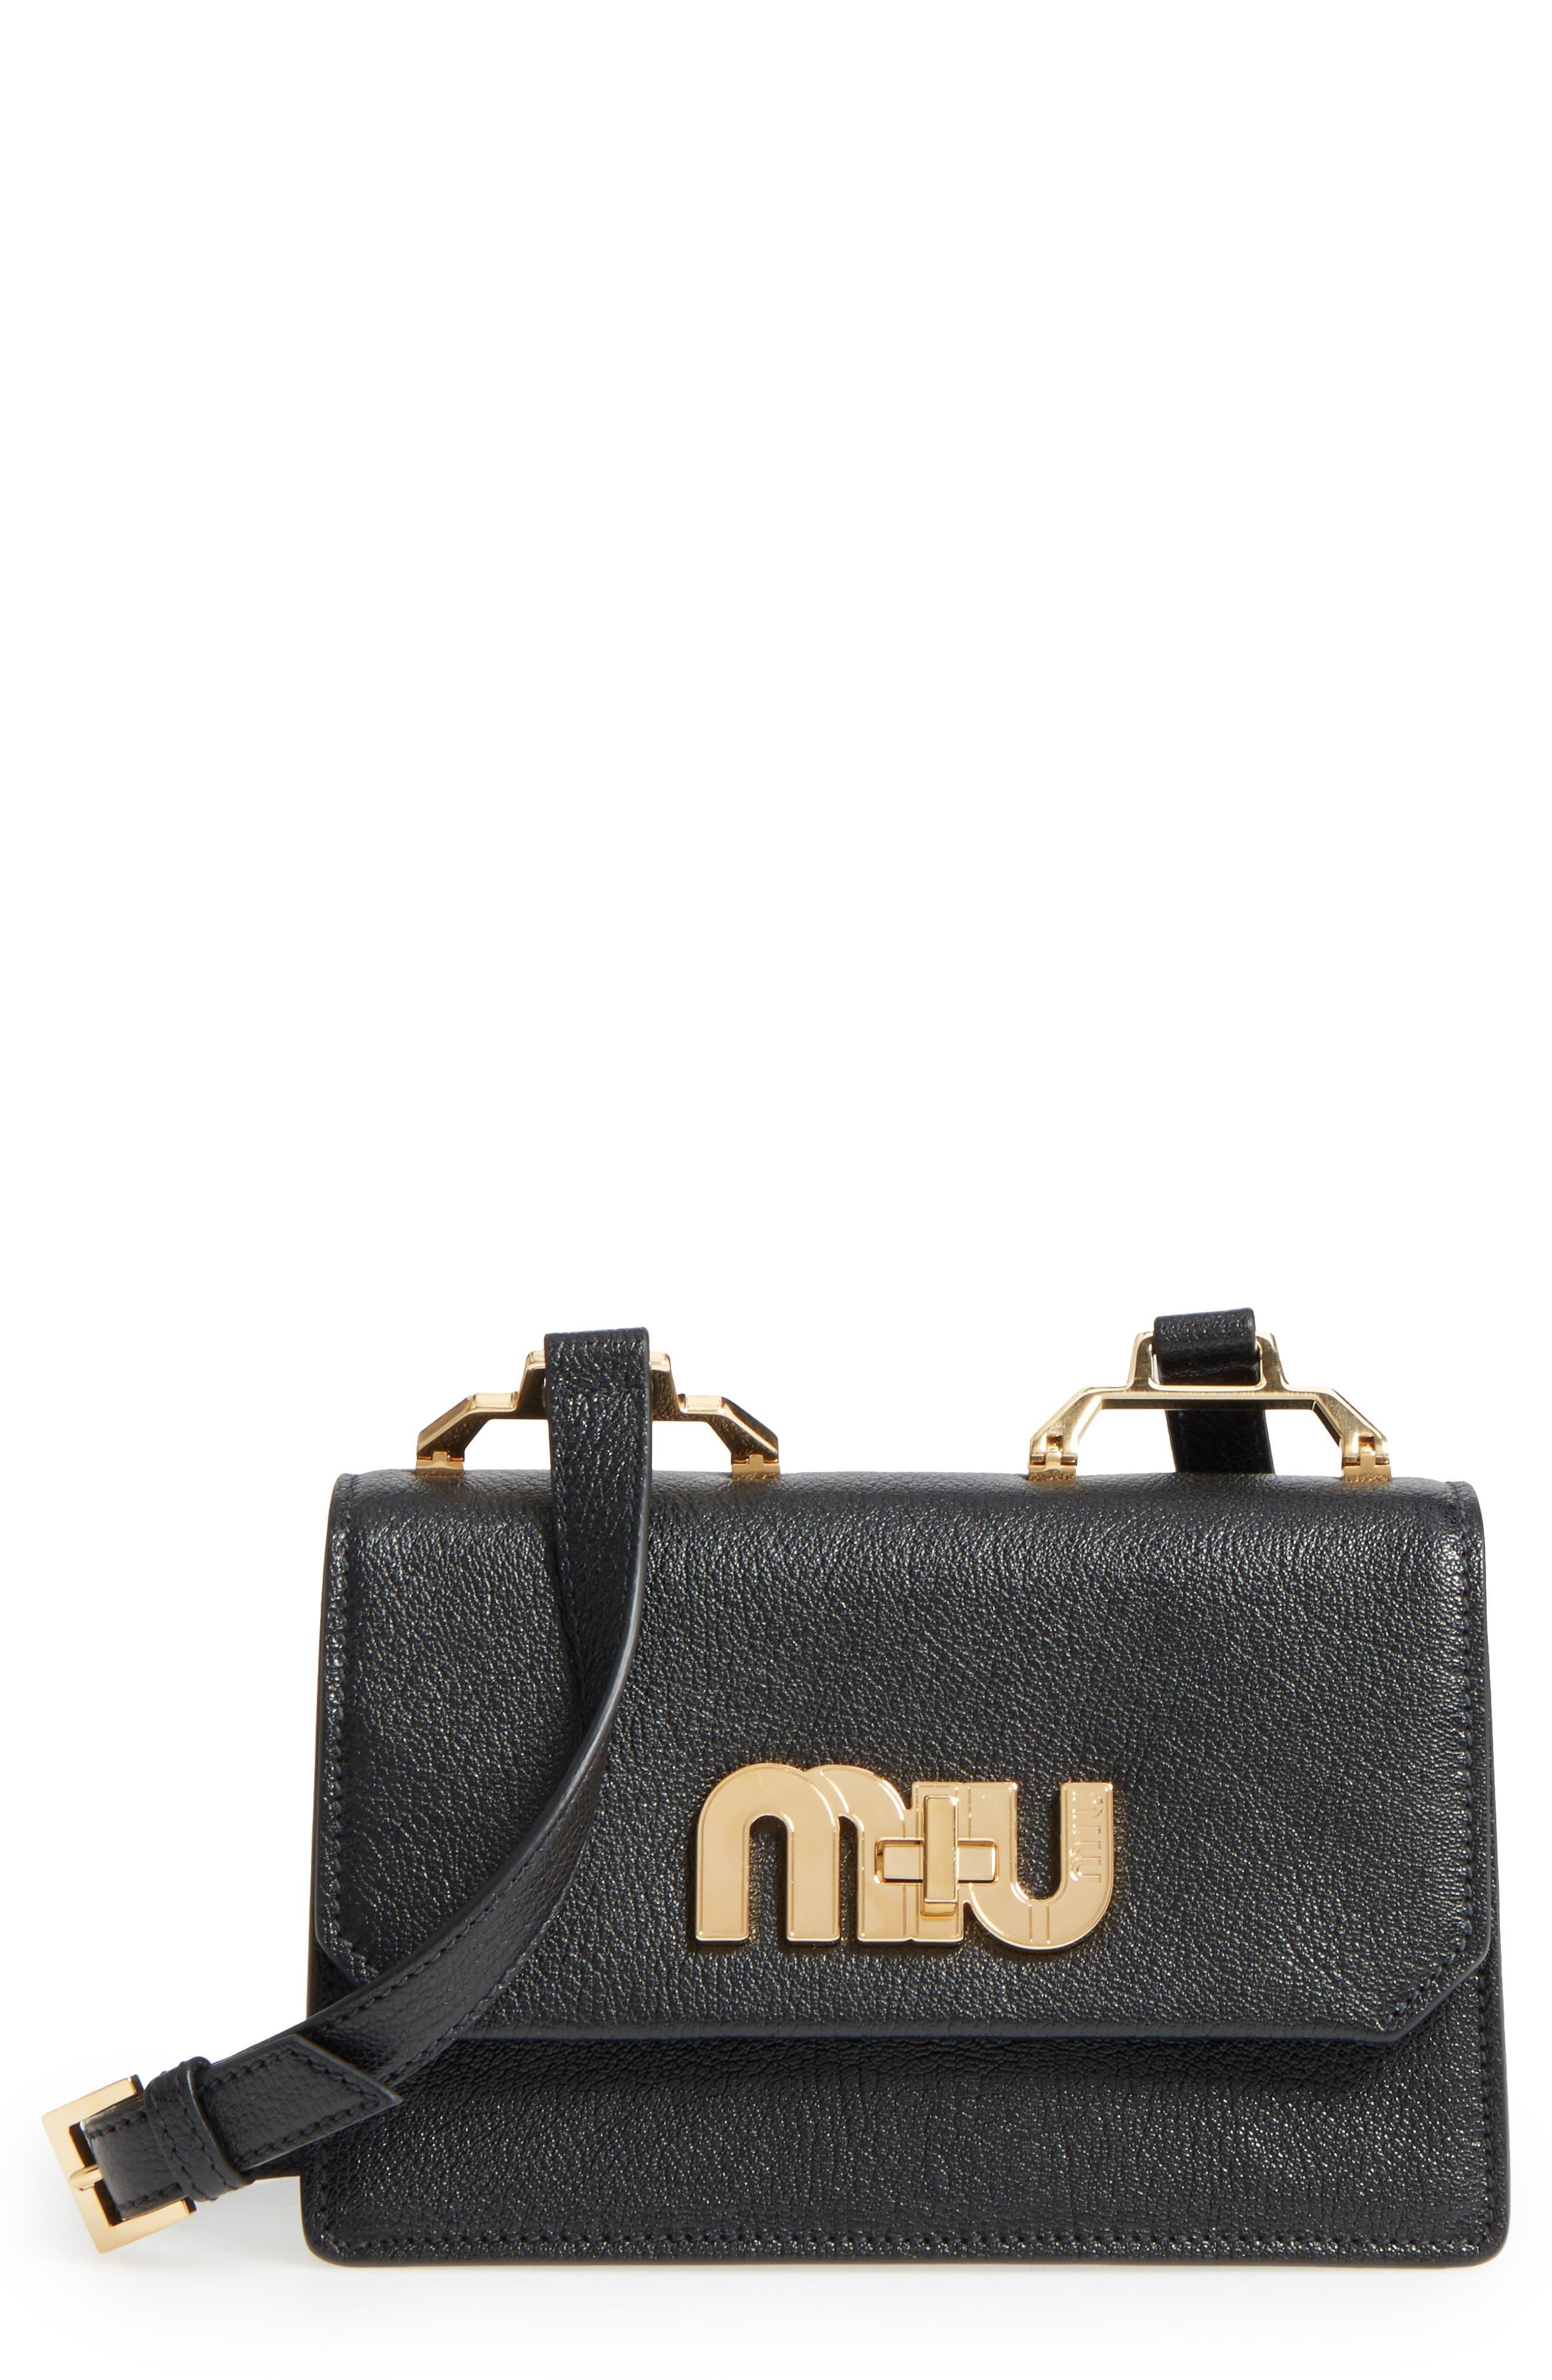 Main Image - Miu Miu Madras Leather Crossbody Bag